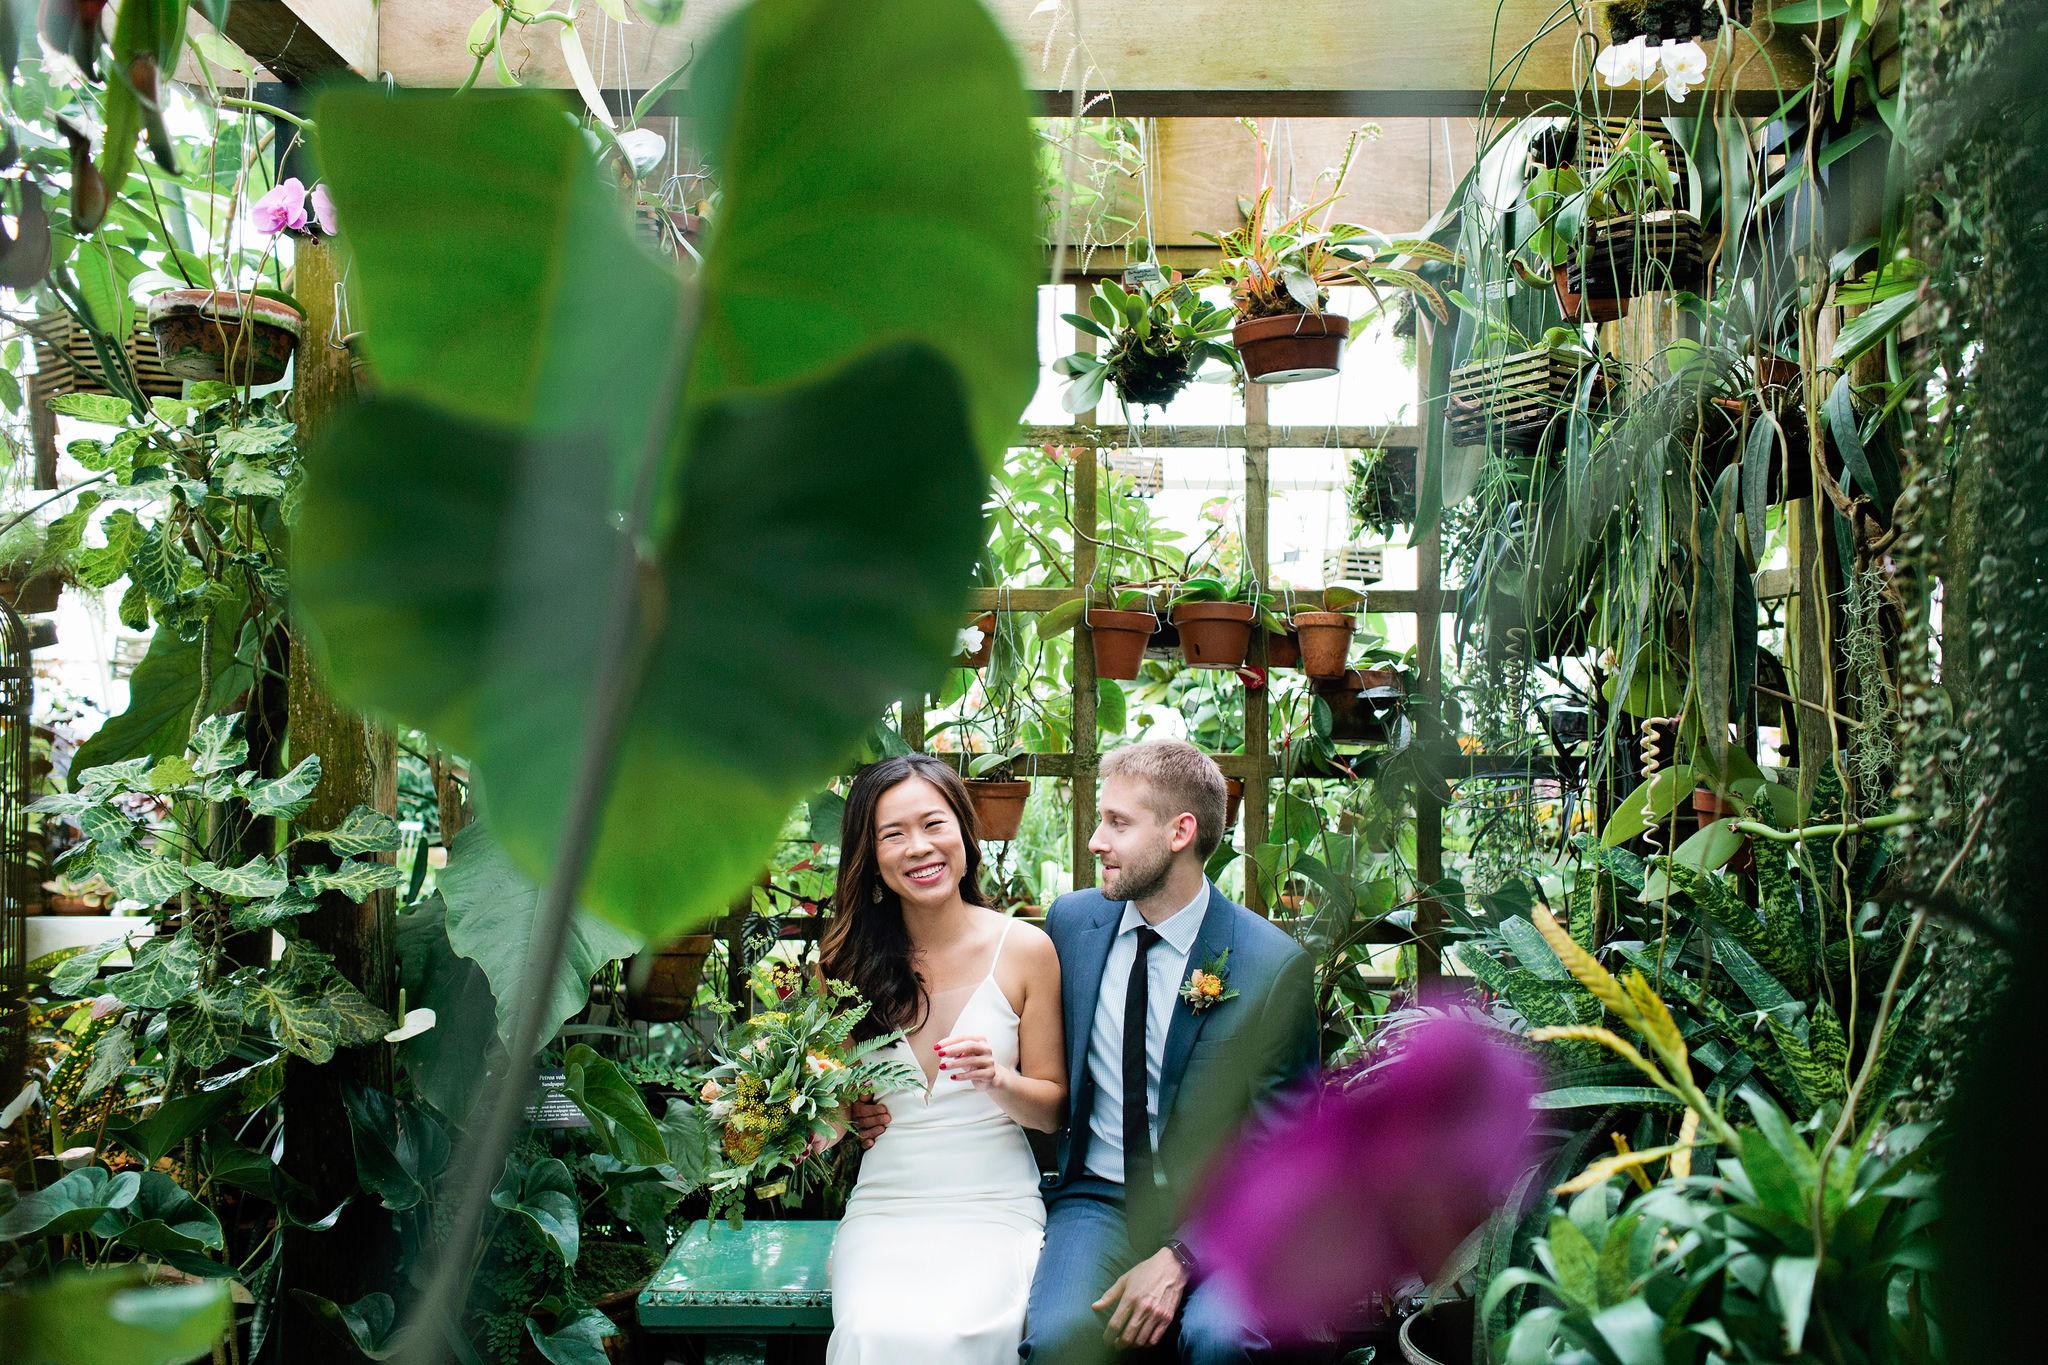 Conservatory-of-Flowers-Wedding-14.JPG